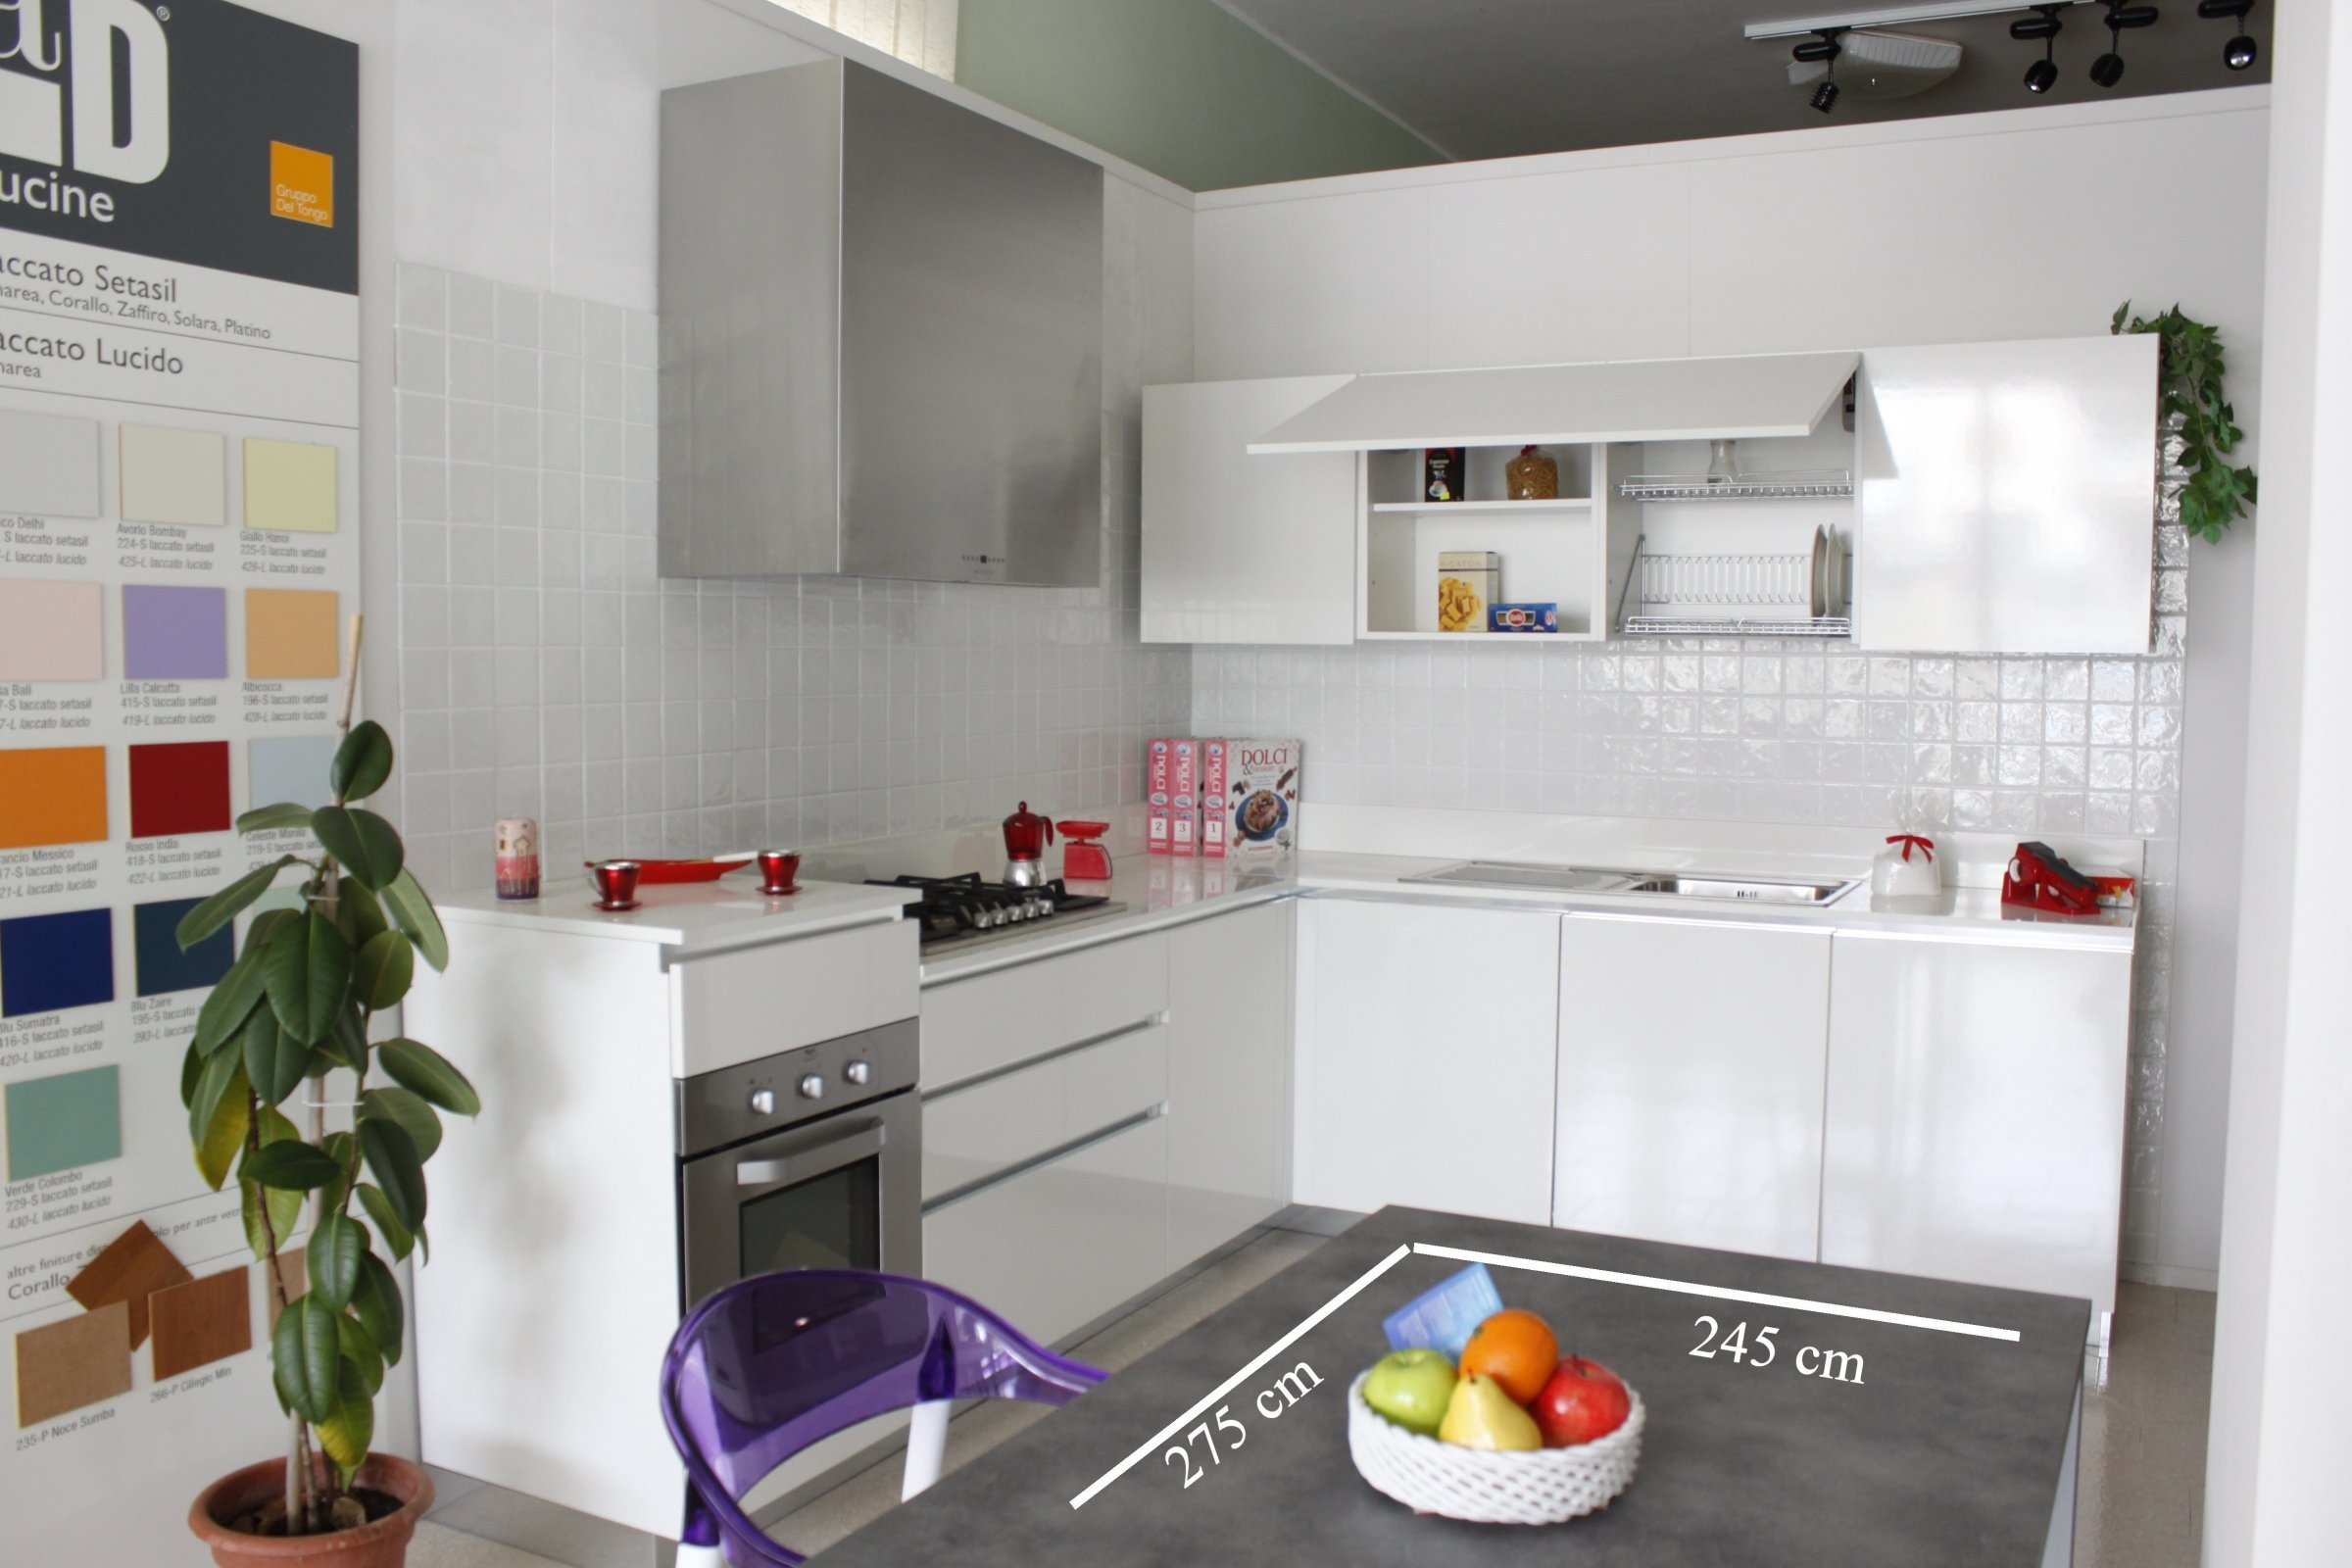 Cucina modello creta bianco - Cucine del tongo catalogo ...